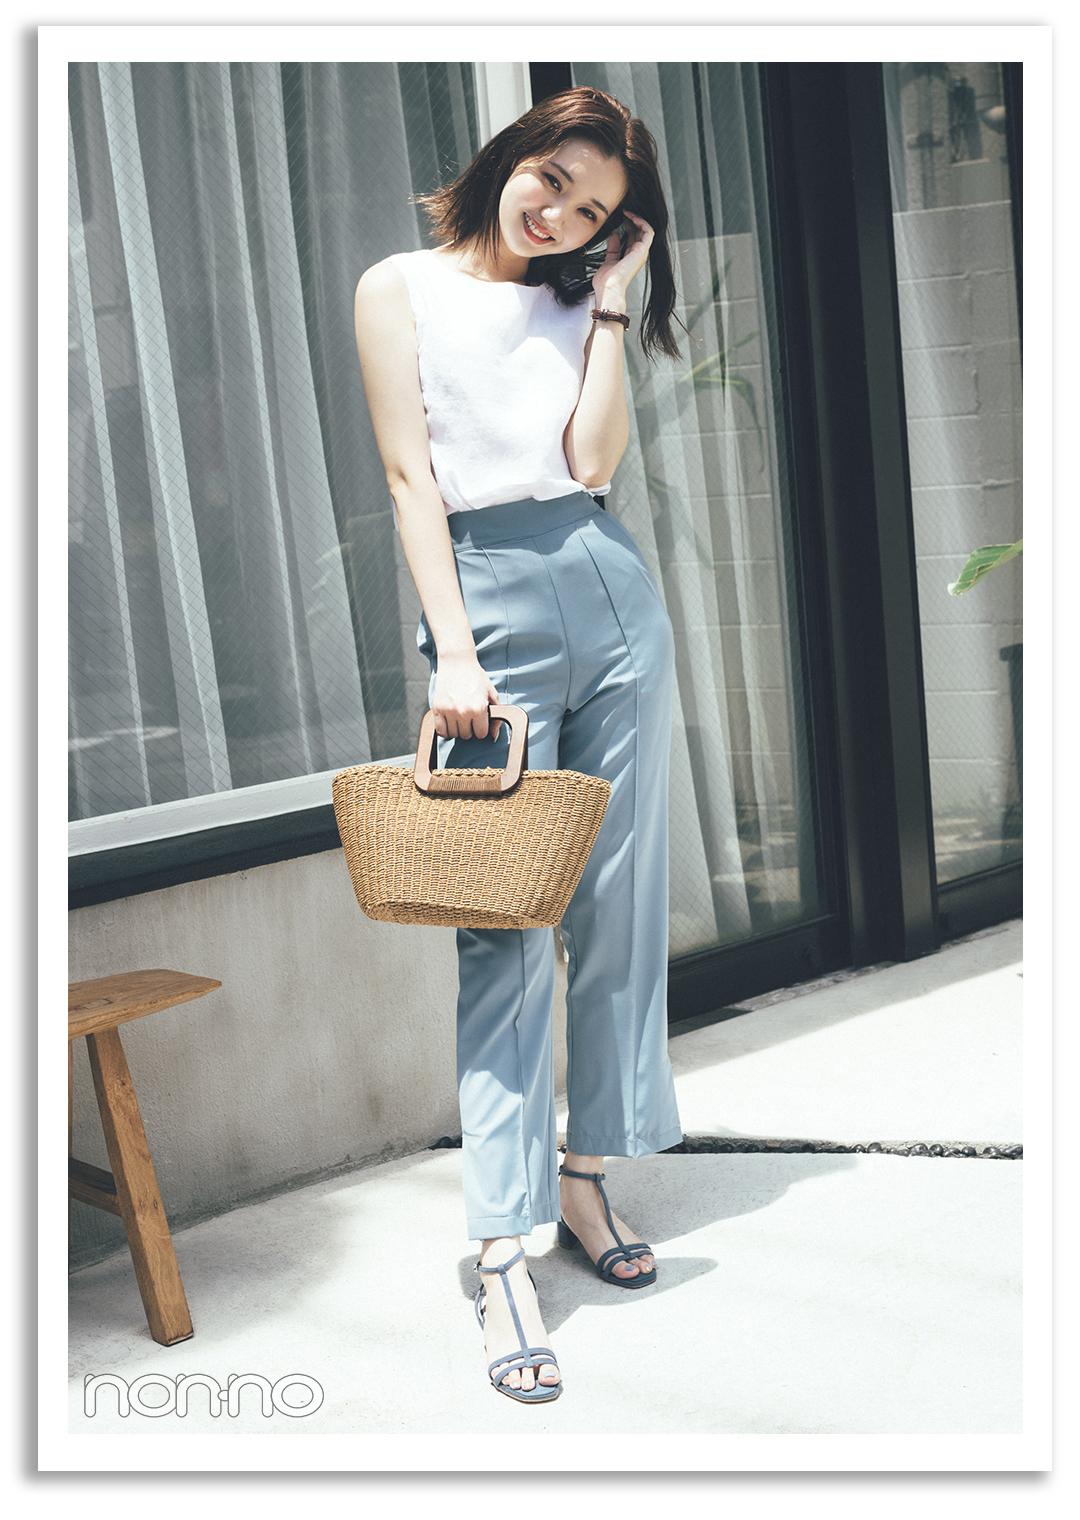 PATTERN1) 白トップス×水色パンツで 清涼感抜群なきれいめカジュアル 江野沢愛美